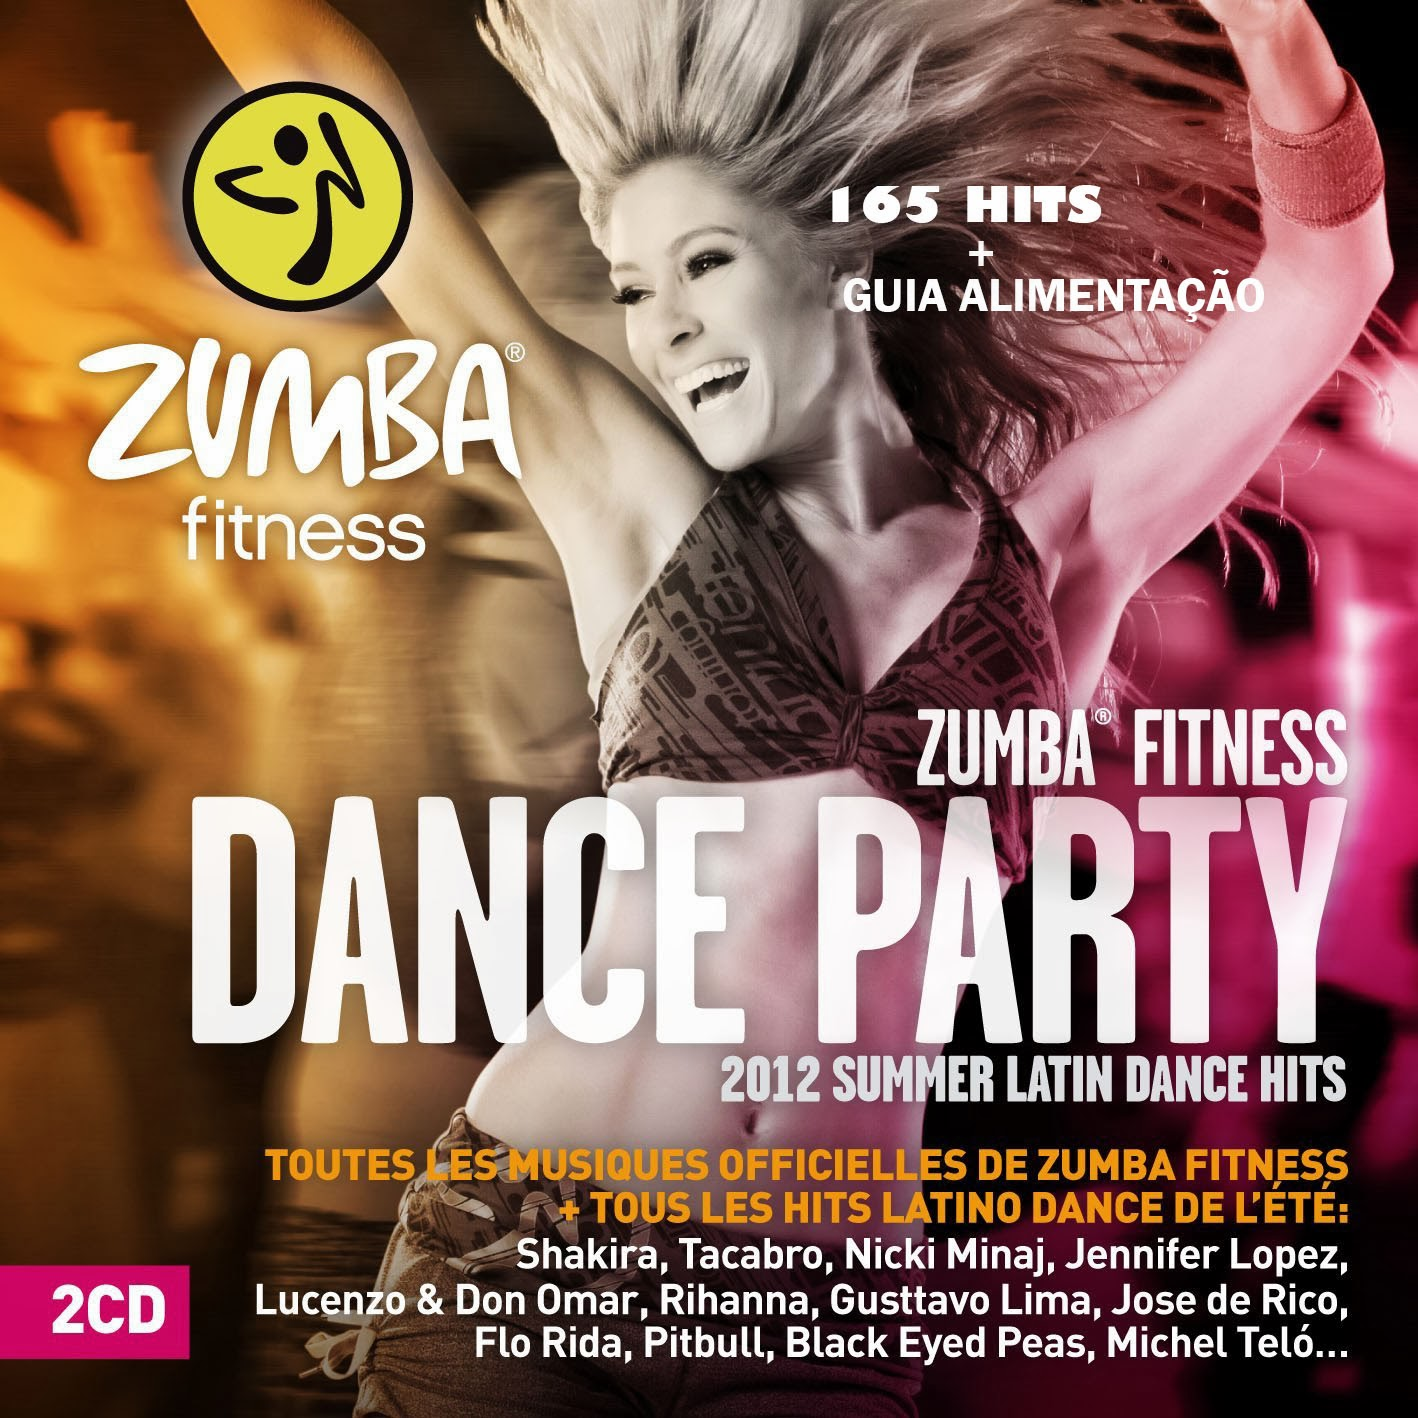 Zumba Fitness Live Dvd: Kit DVD Zumba Fitness - Dança E Fitness